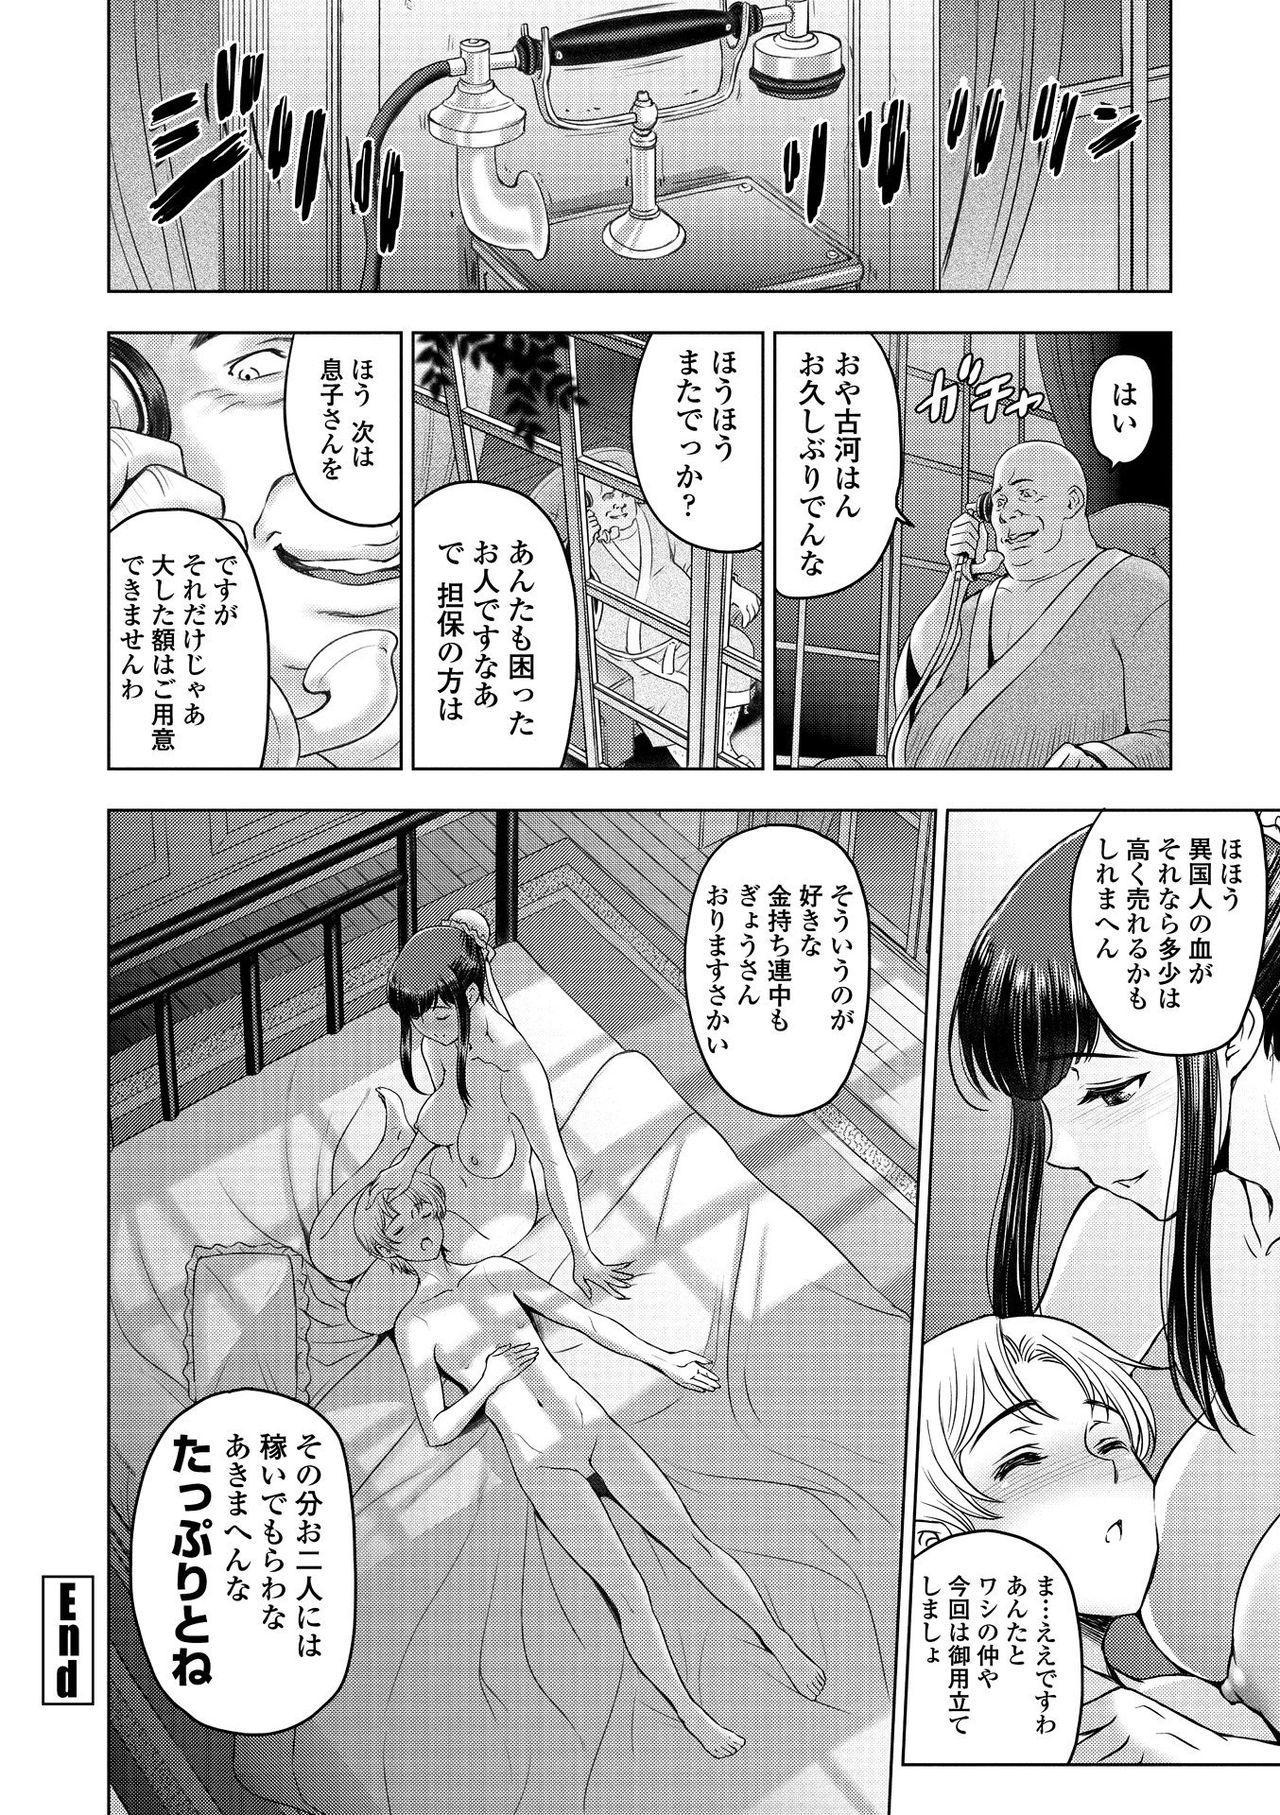 Dosukebe Onei-chan 165